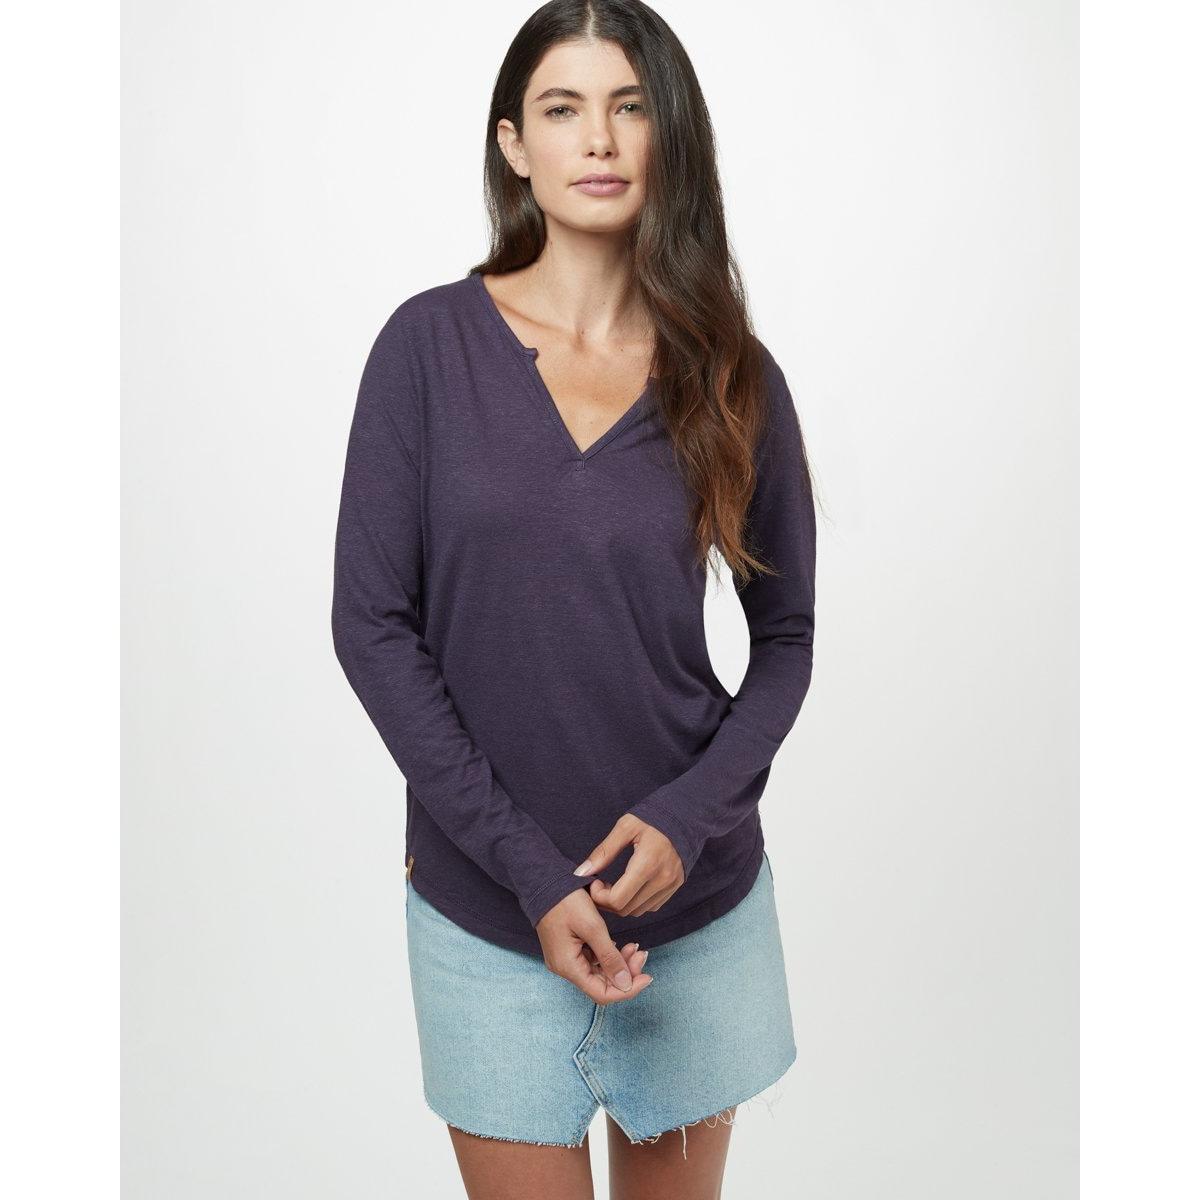 Moraine Top Long Sleeve - Women's